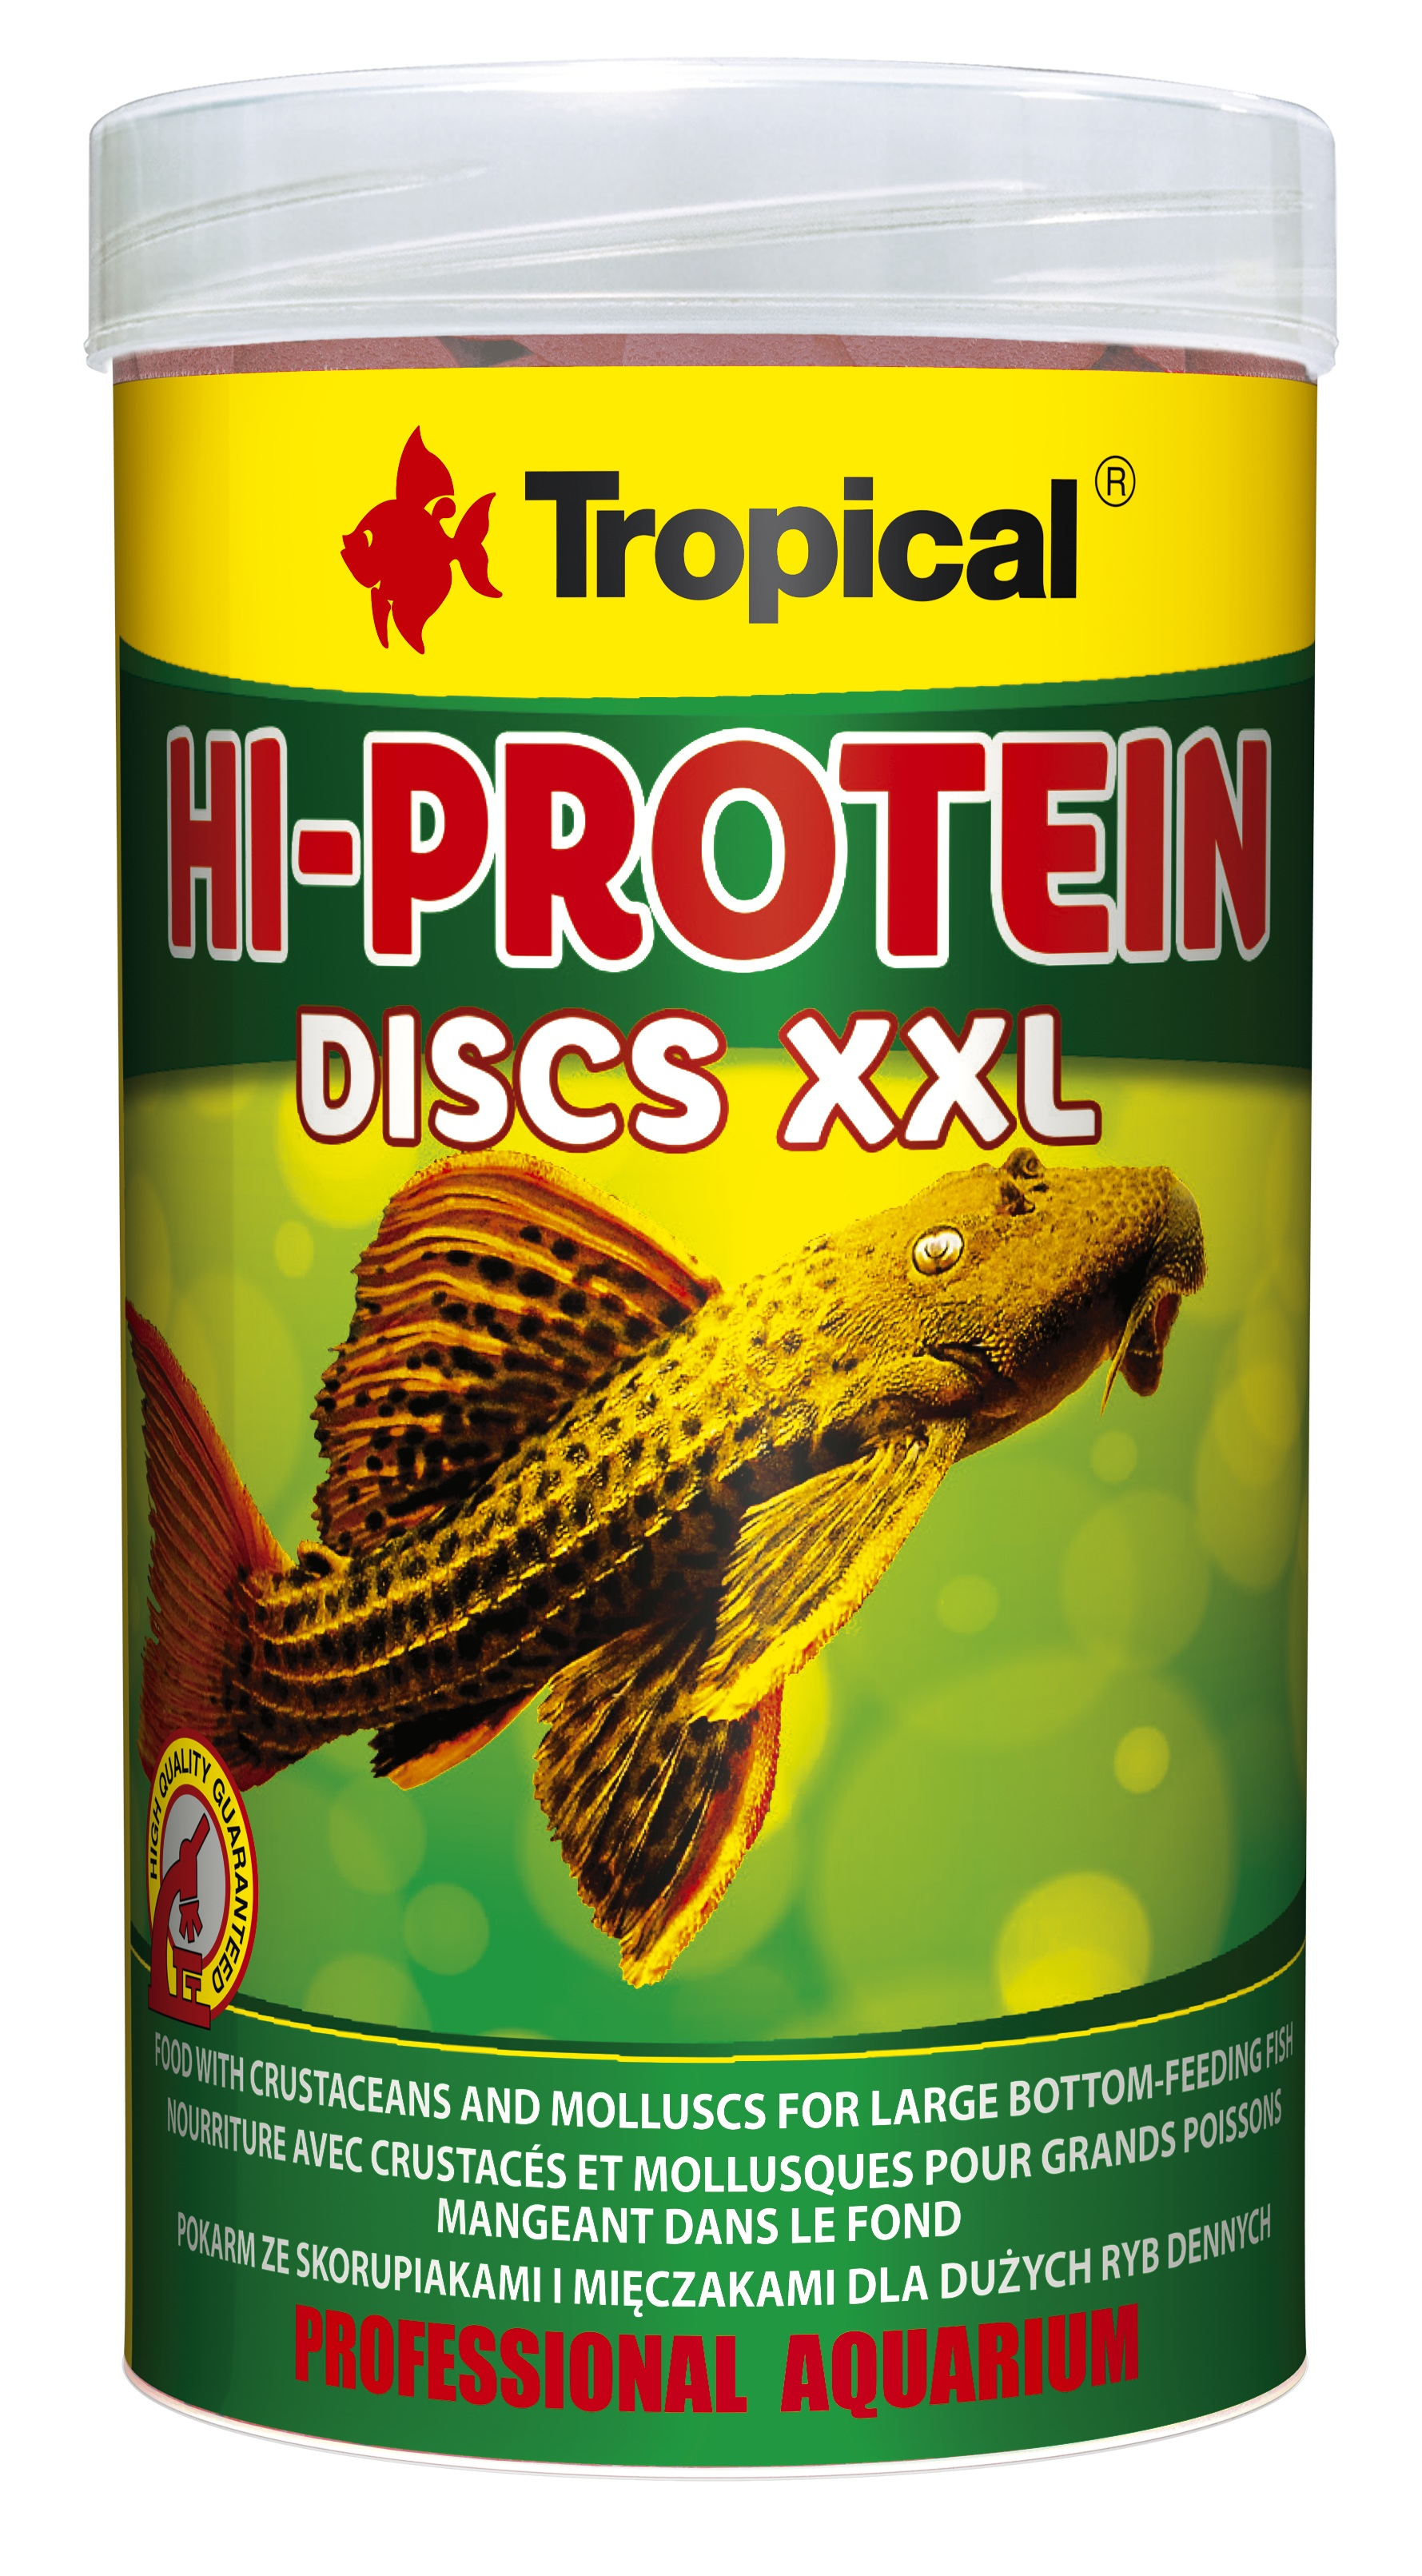 Tropical Hi-Protein Discs XXL - 250ml/125g